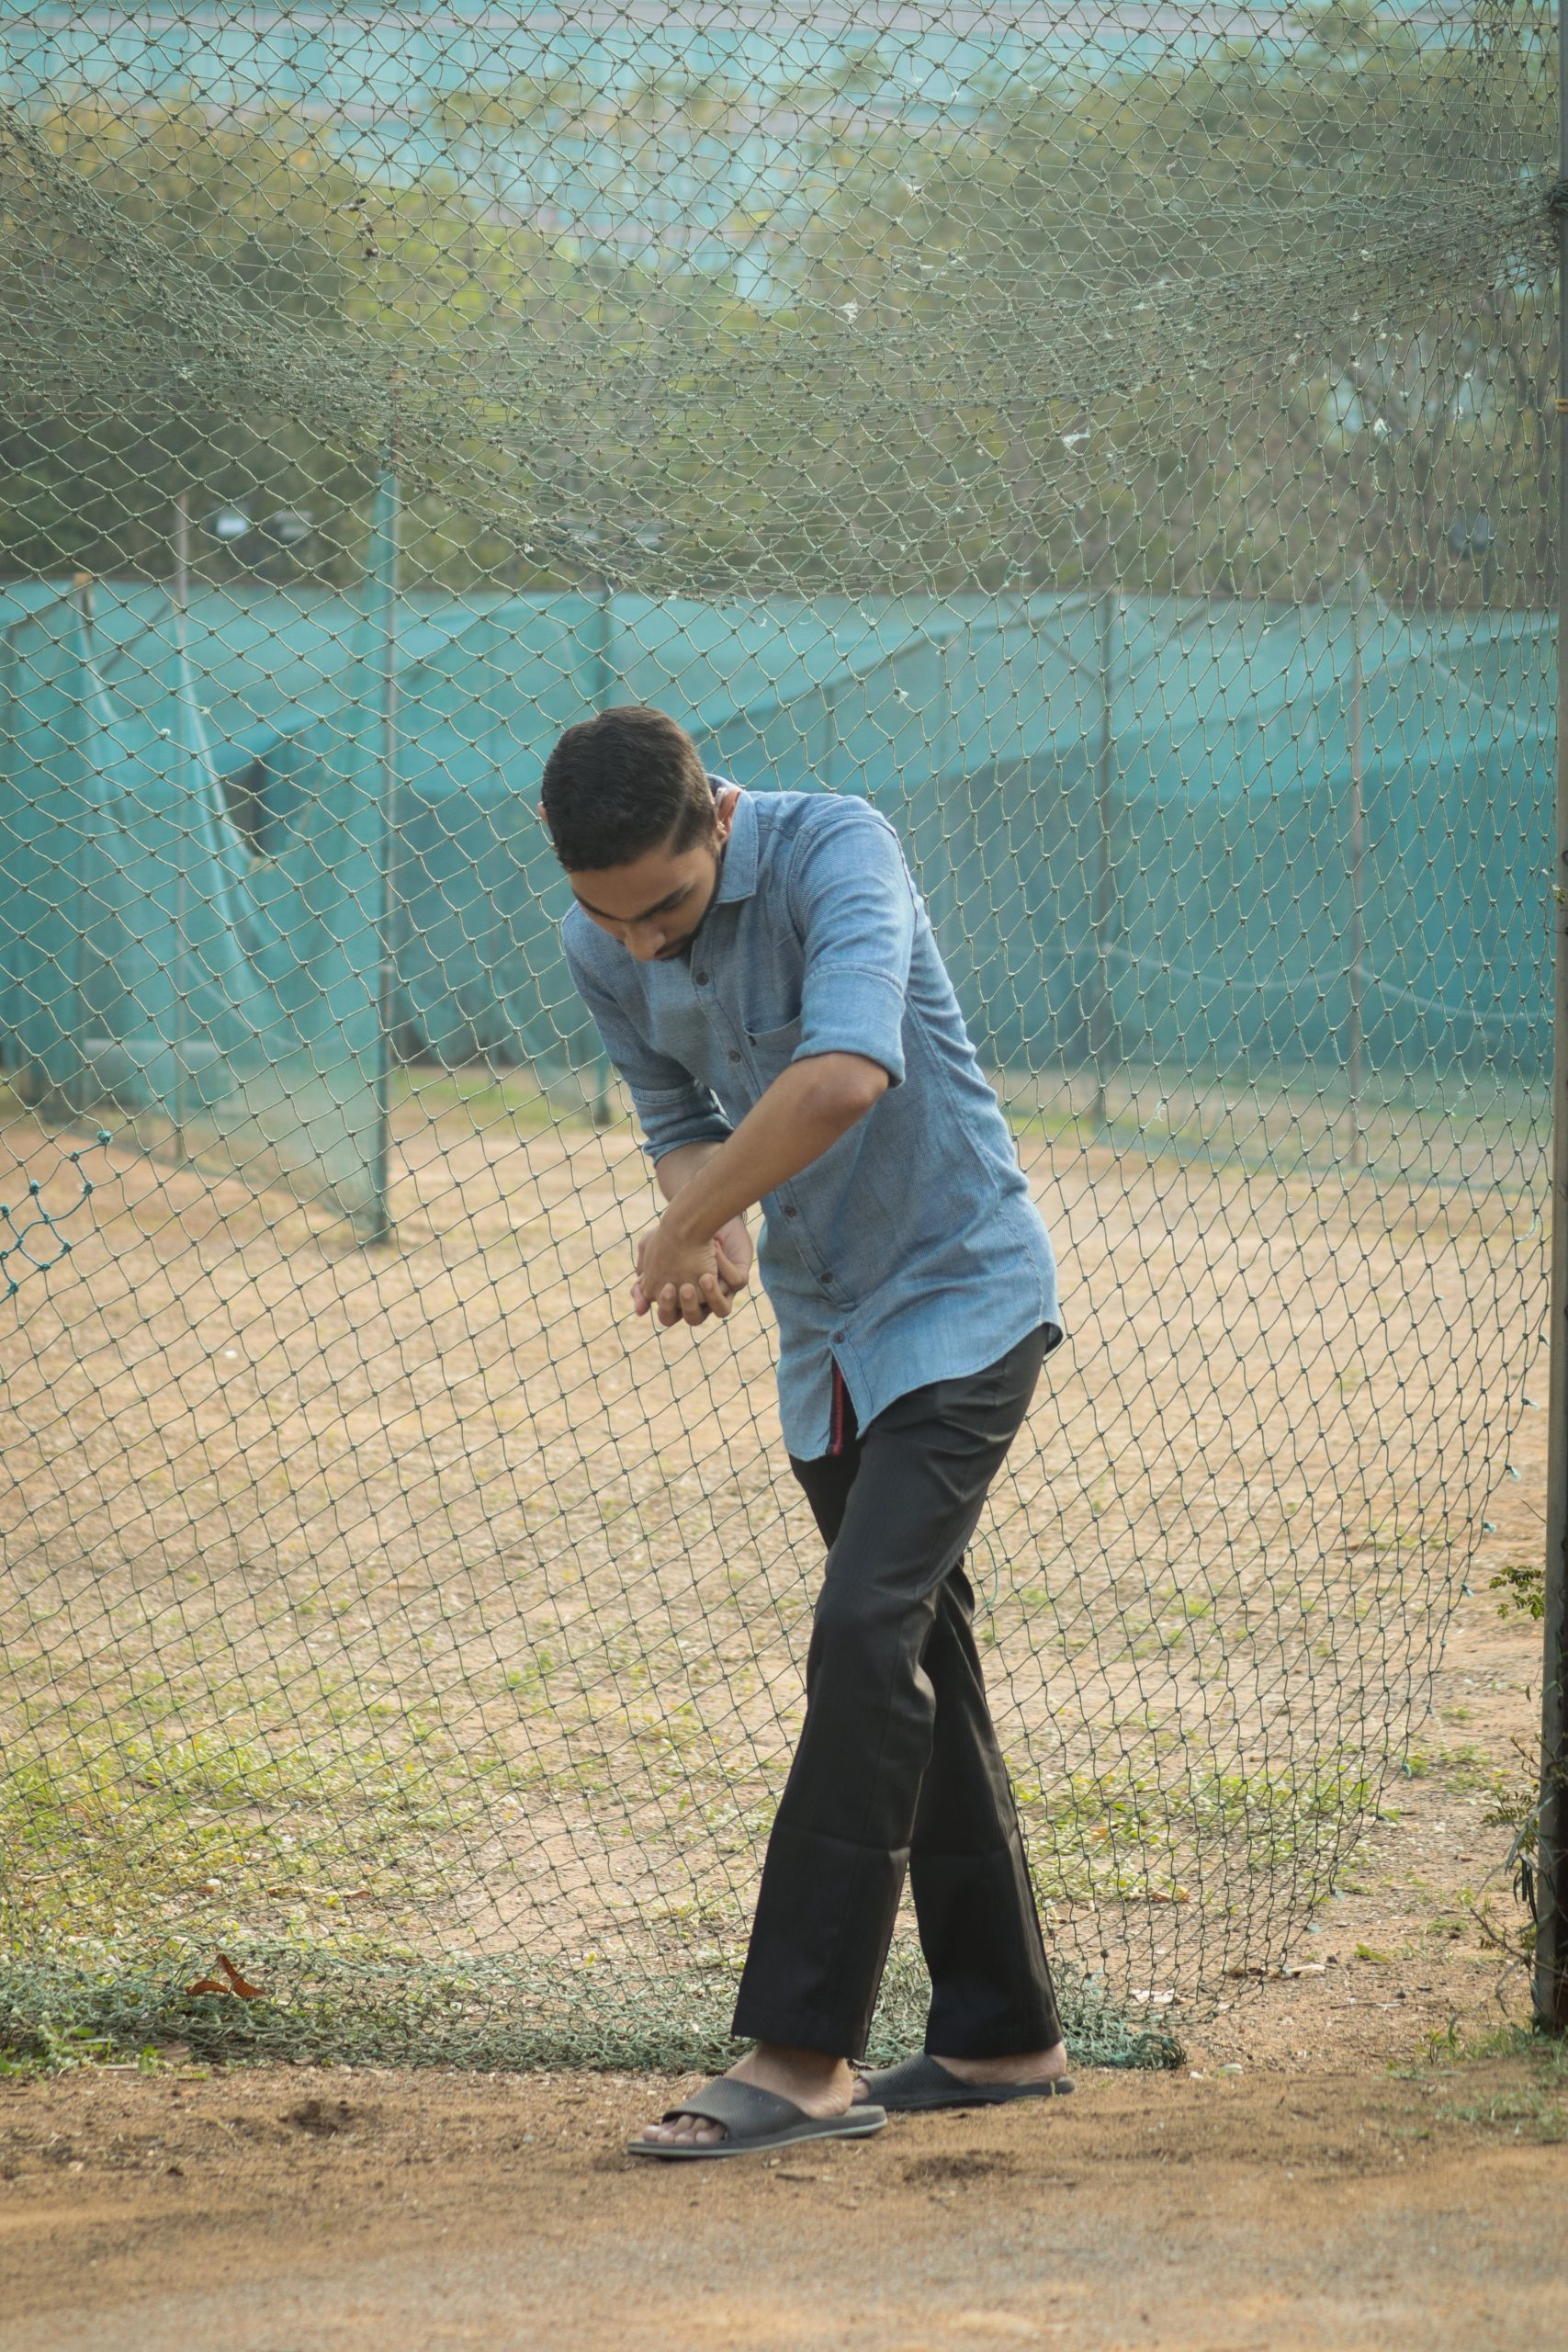 A boy acting to play a cricket shot